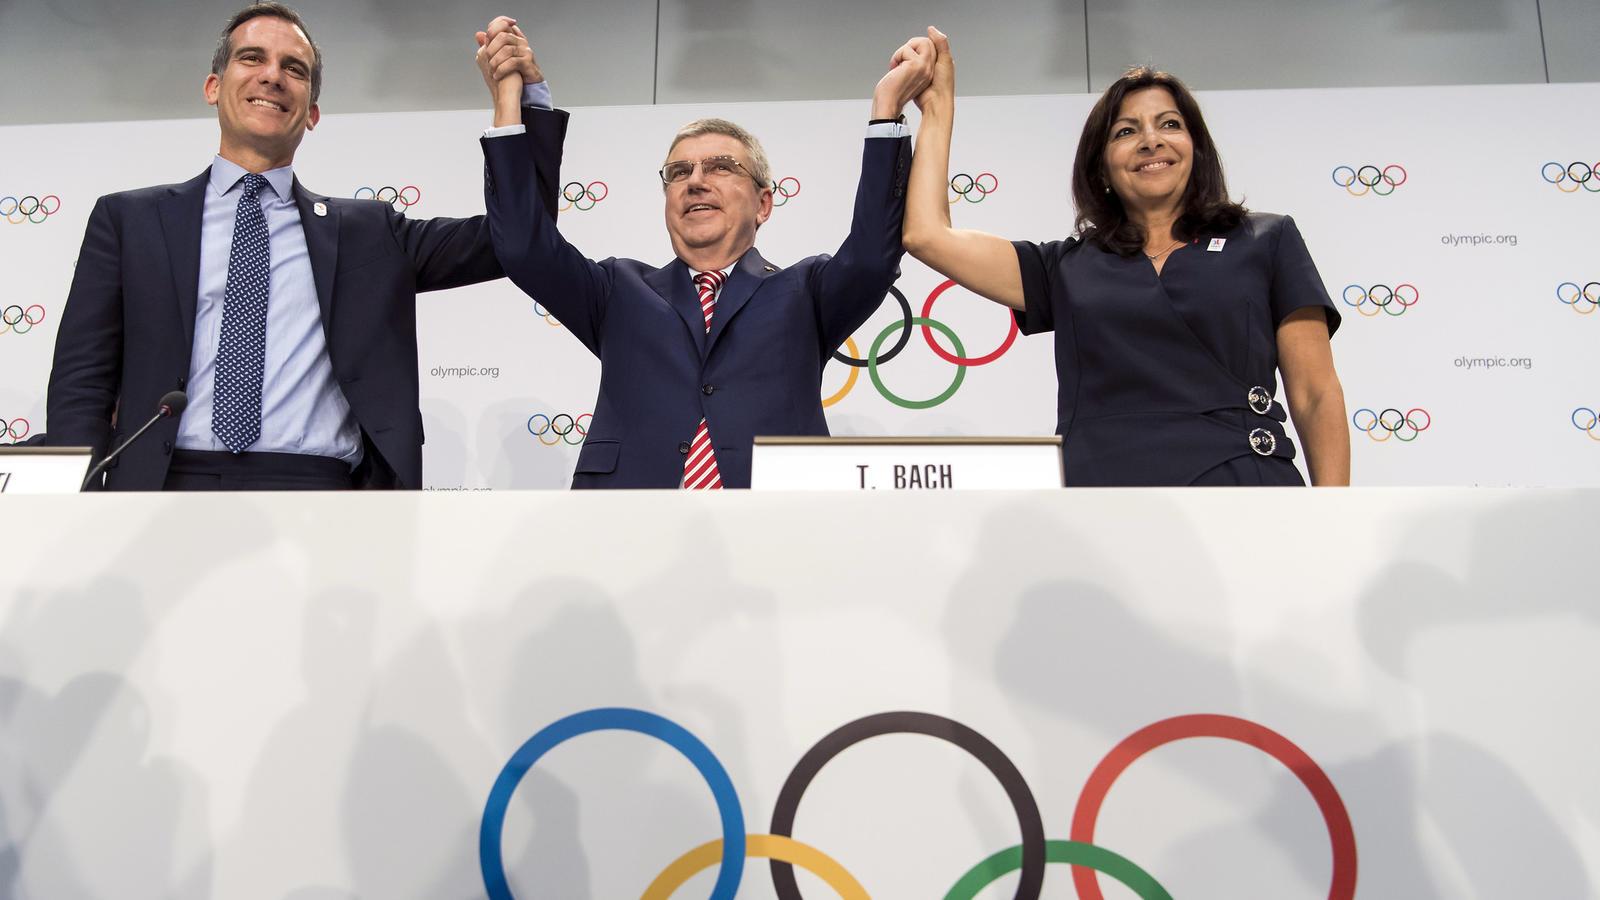 Los Angeles Mayor Eric Garcetti, left, celebrates with International Olympic Committee President Thomas Bach and Paris Mayor Anne Hidalgo. (Jean-Christophe Bott / AP)